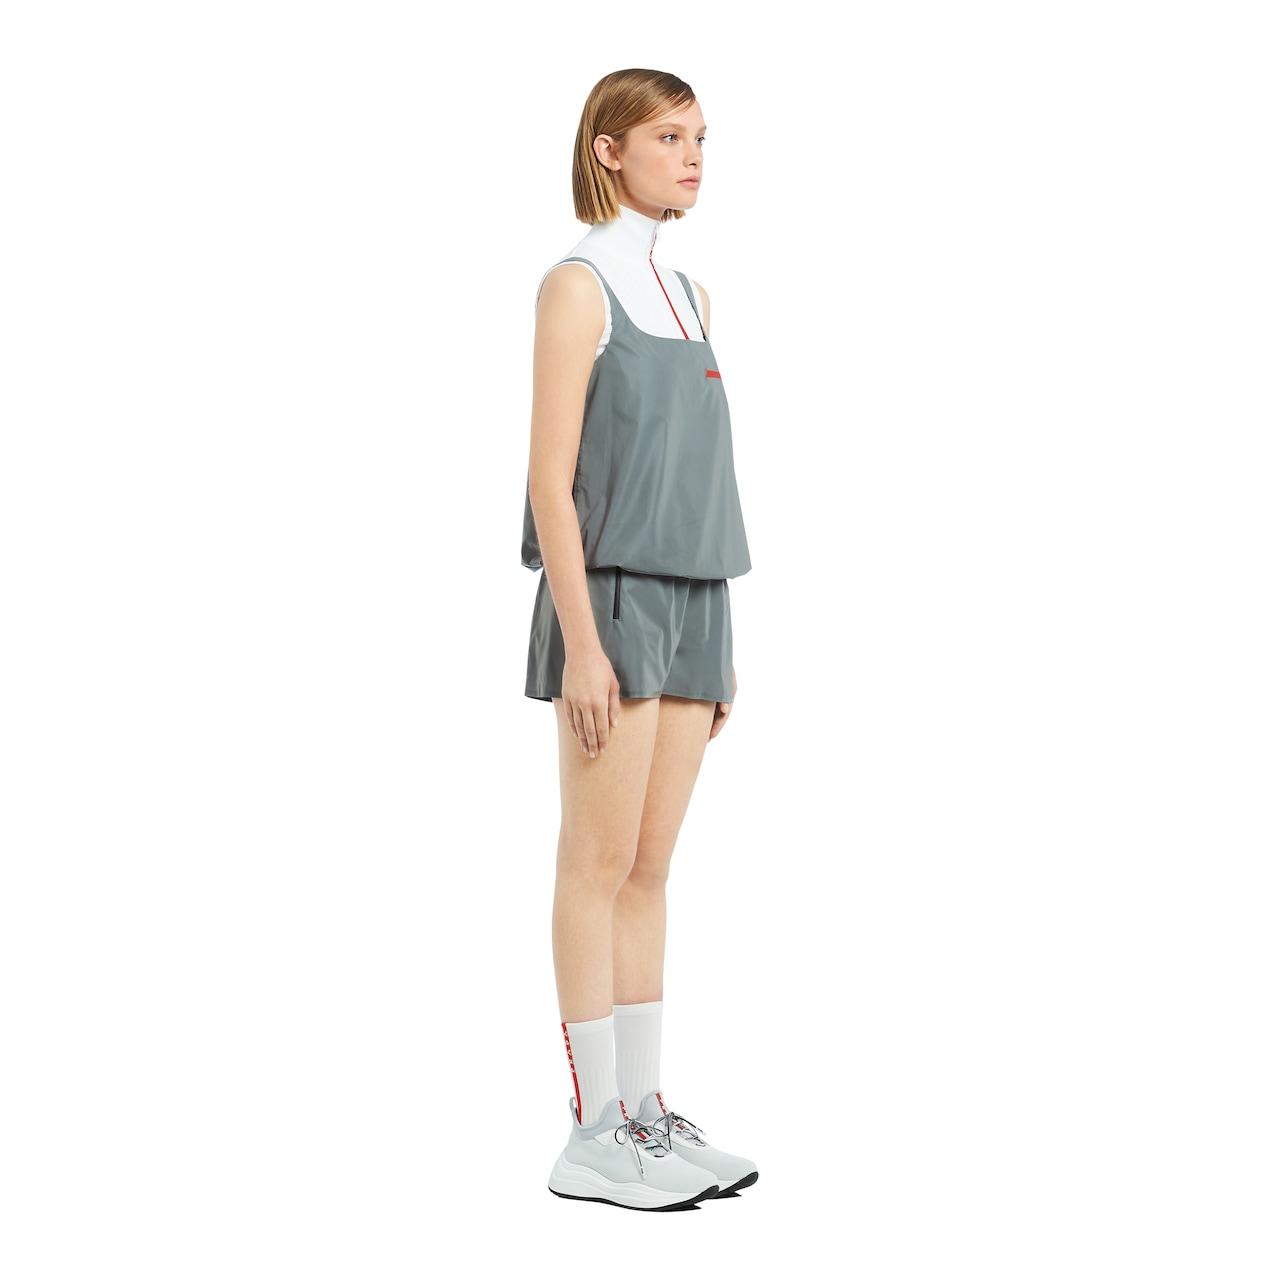 Prada 反光效果织物面料上衣 LR-L017 3